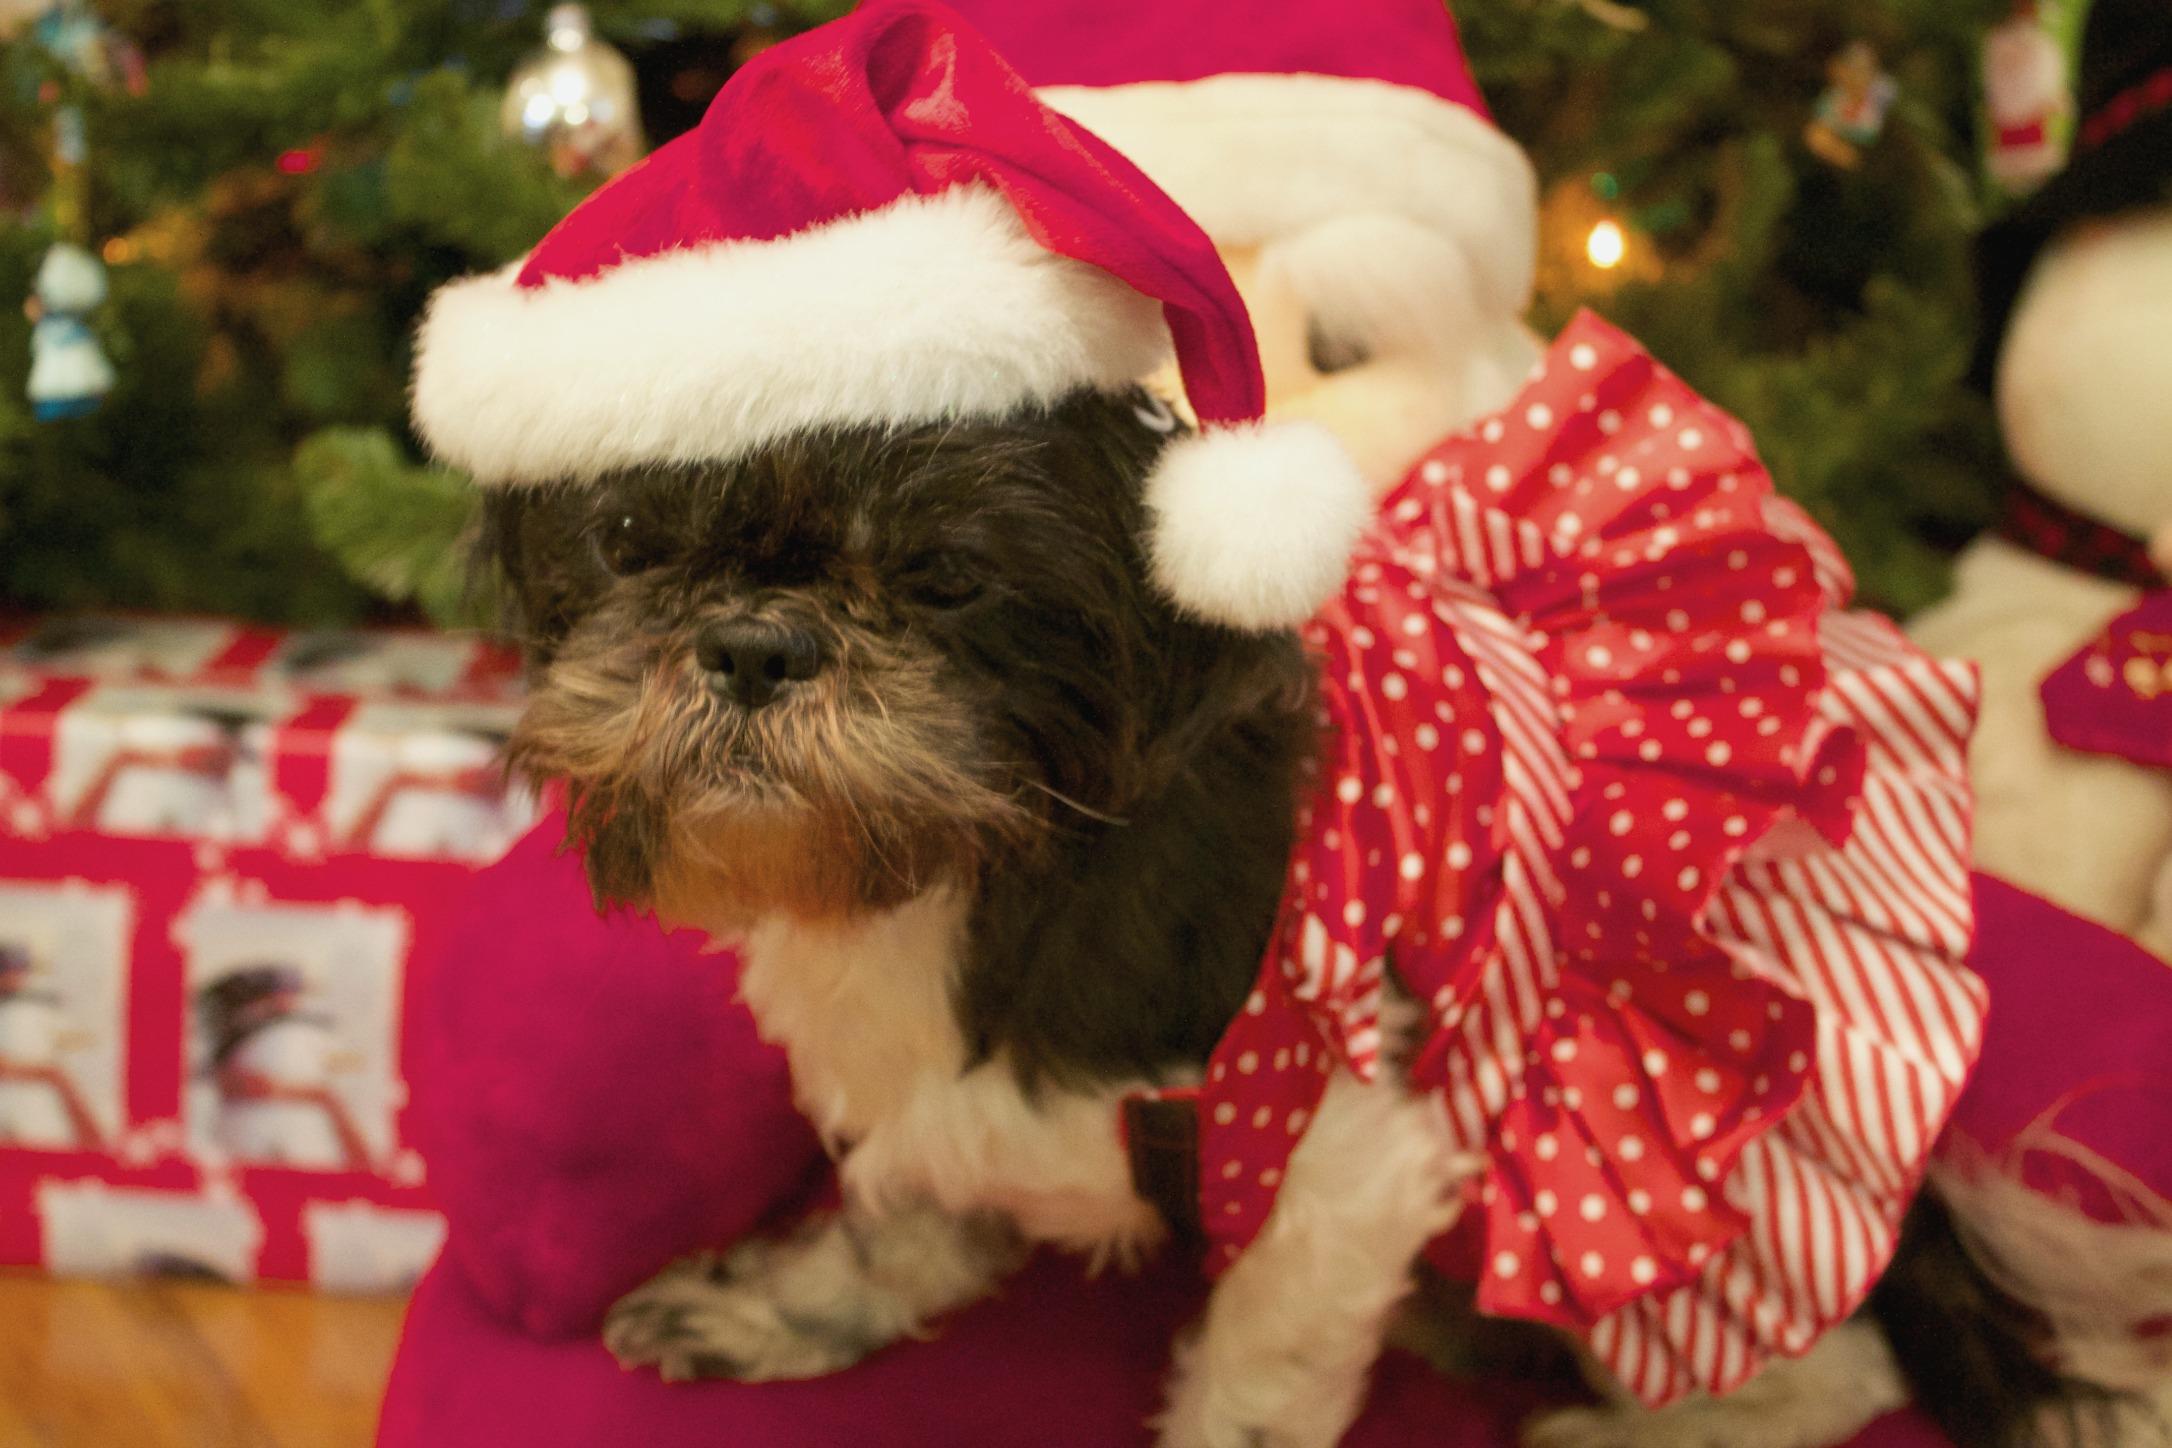 pet snacks-dog dressed up as Santa